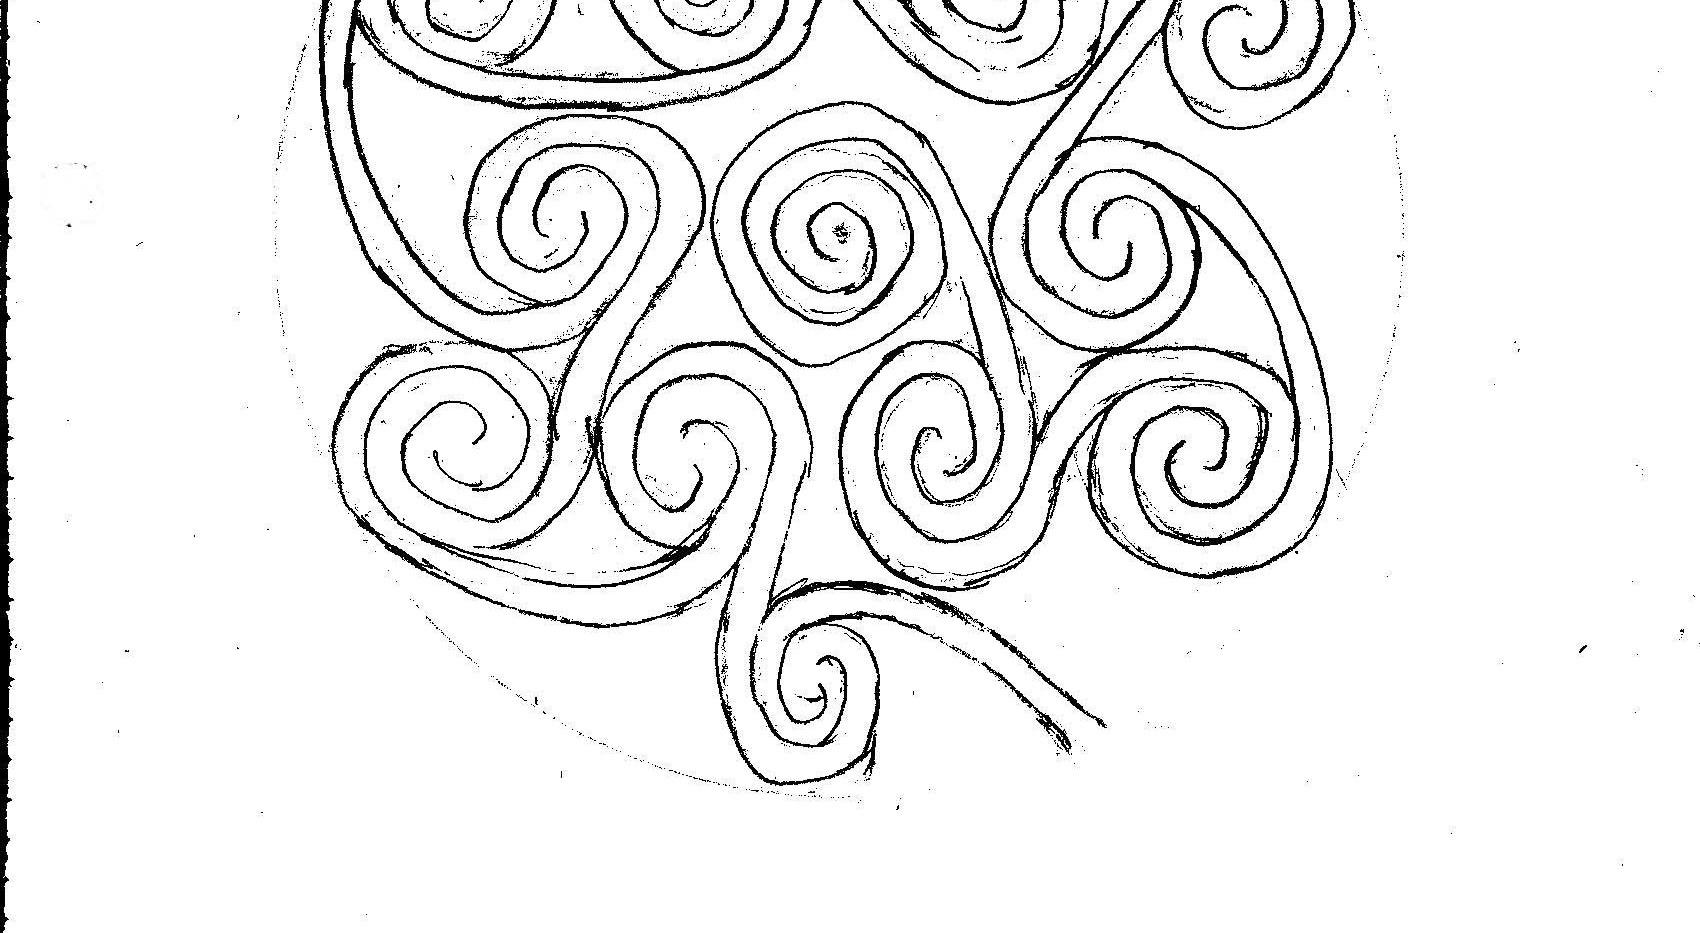 Celtic-labyrinth-#1web.jpg